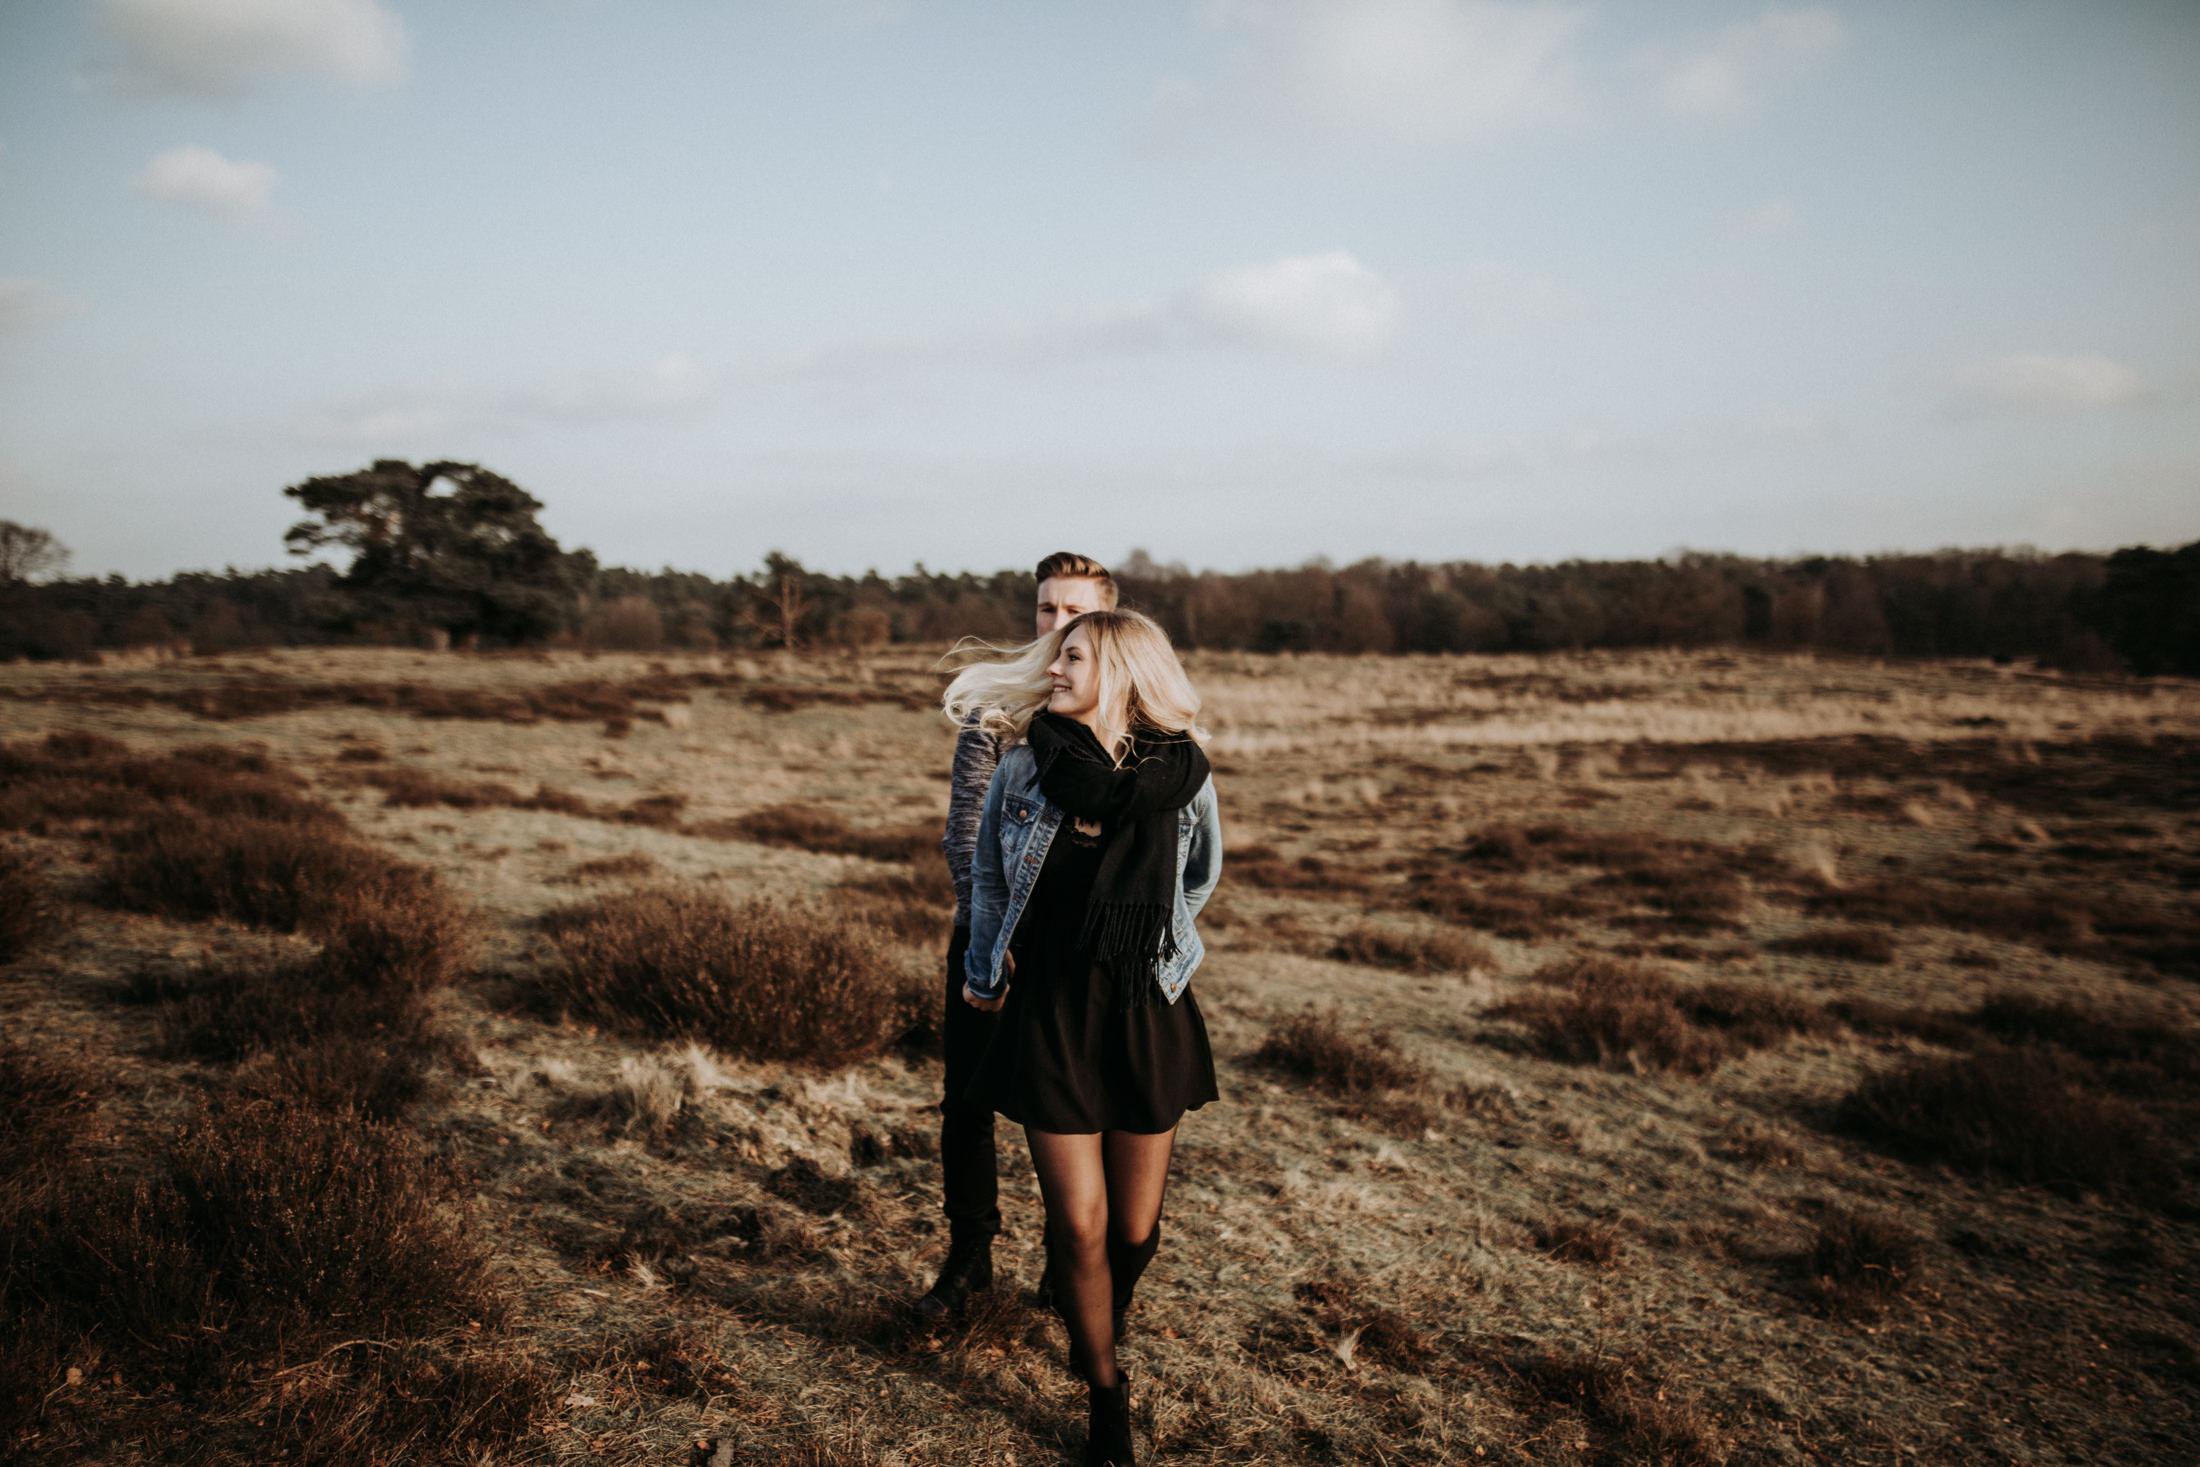 Wedding_Photographer_Mallorca_Daniela-Marquardt_Photography_CanaryIslands_Lanzarote_Iceland_Tuskany_Santorini_Portugal__Austria_Elopement_Hochzeitsfotograf_Milena_Marvin_12